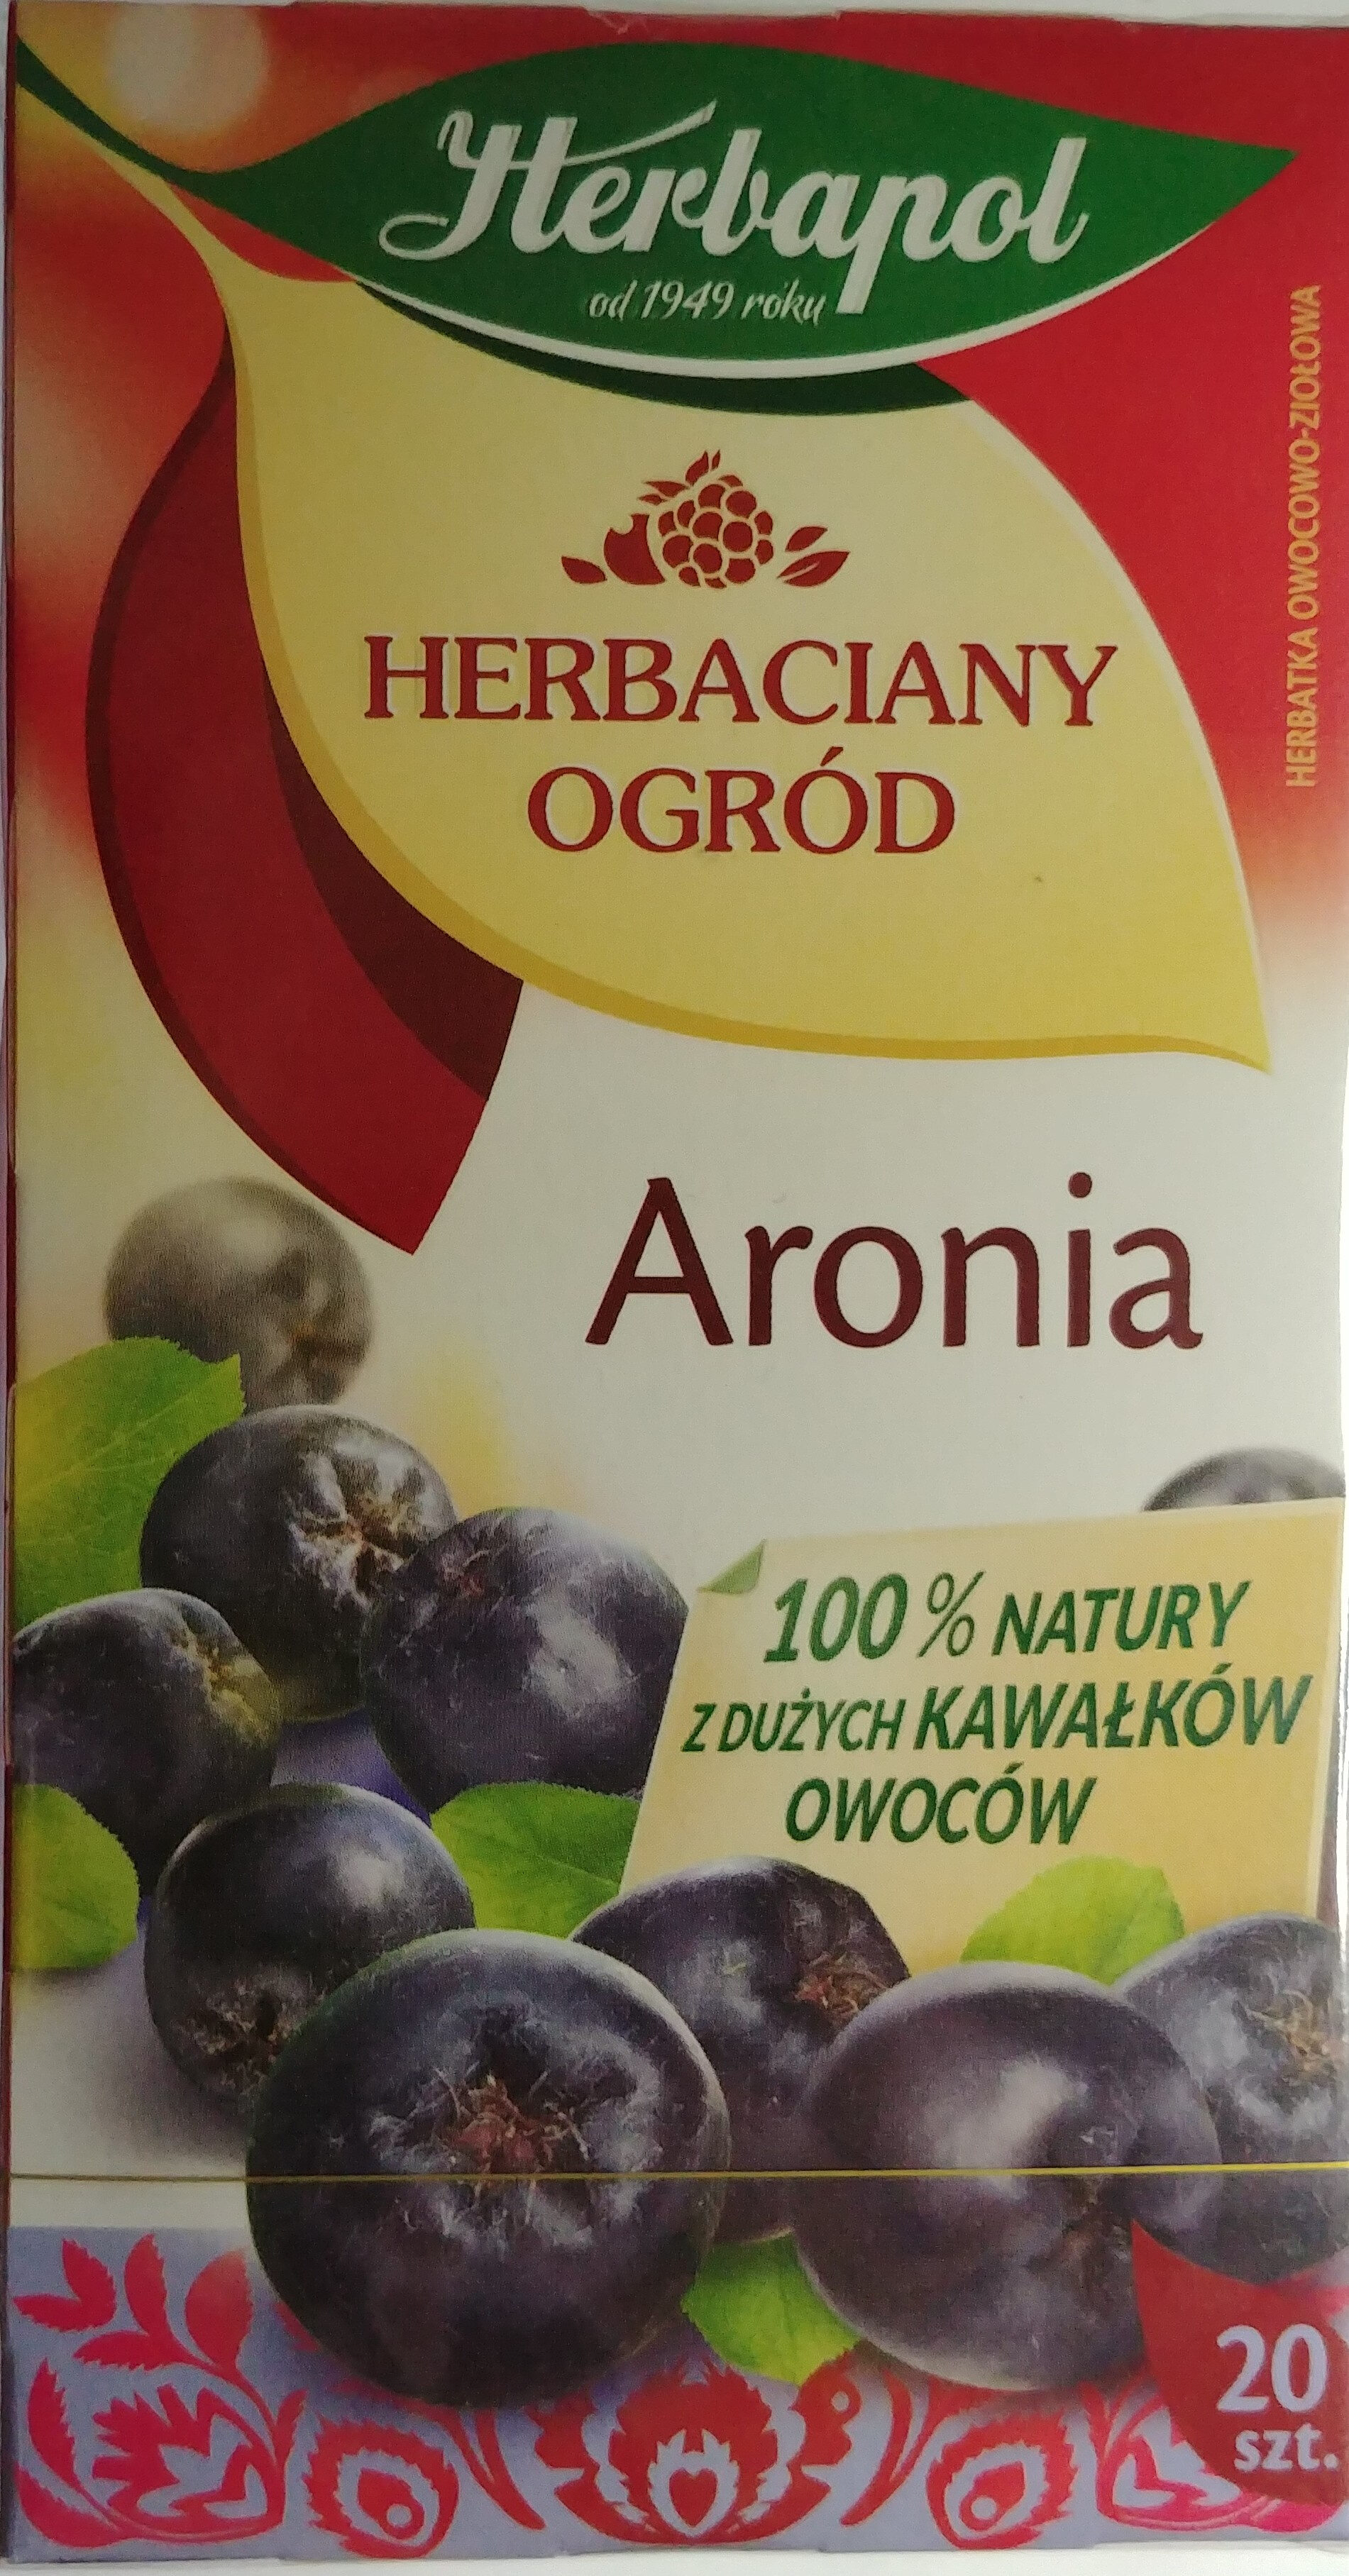 Herb. aronia Herbapol 20SZT - Produkt - pl